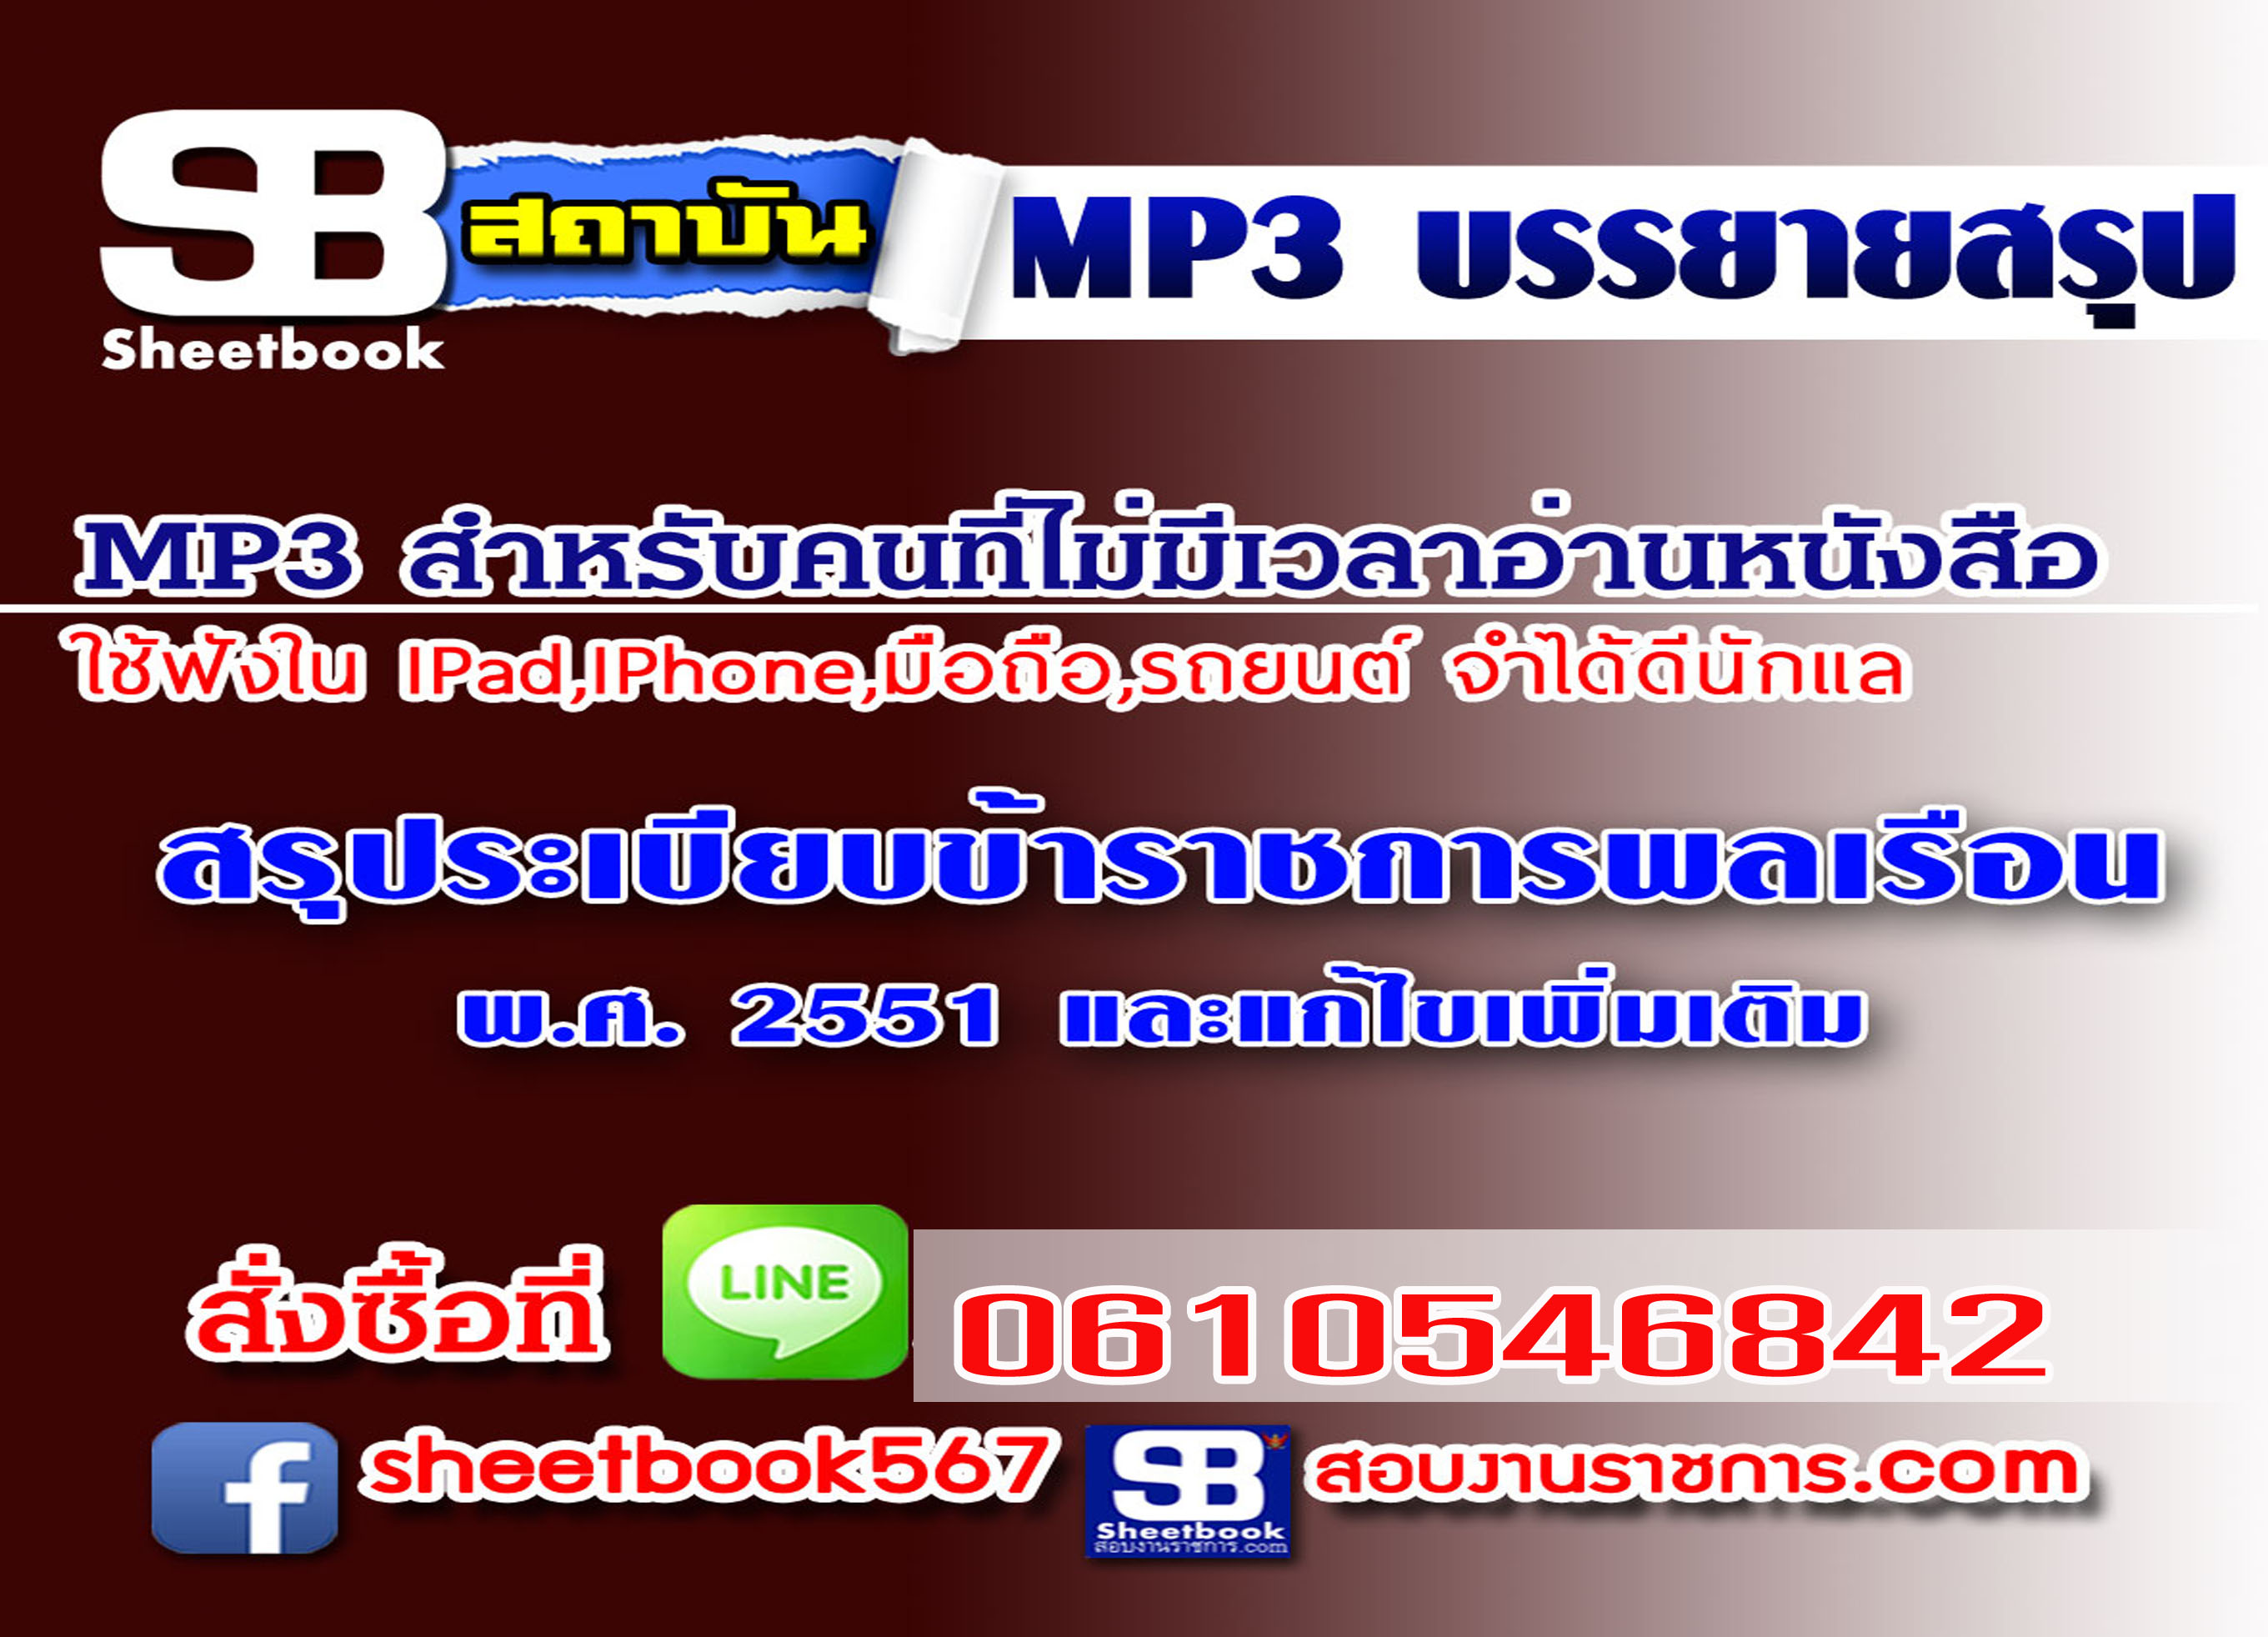 P064 - สรุประเบียบข้าราชการพลเรือน พ.ศ.2551